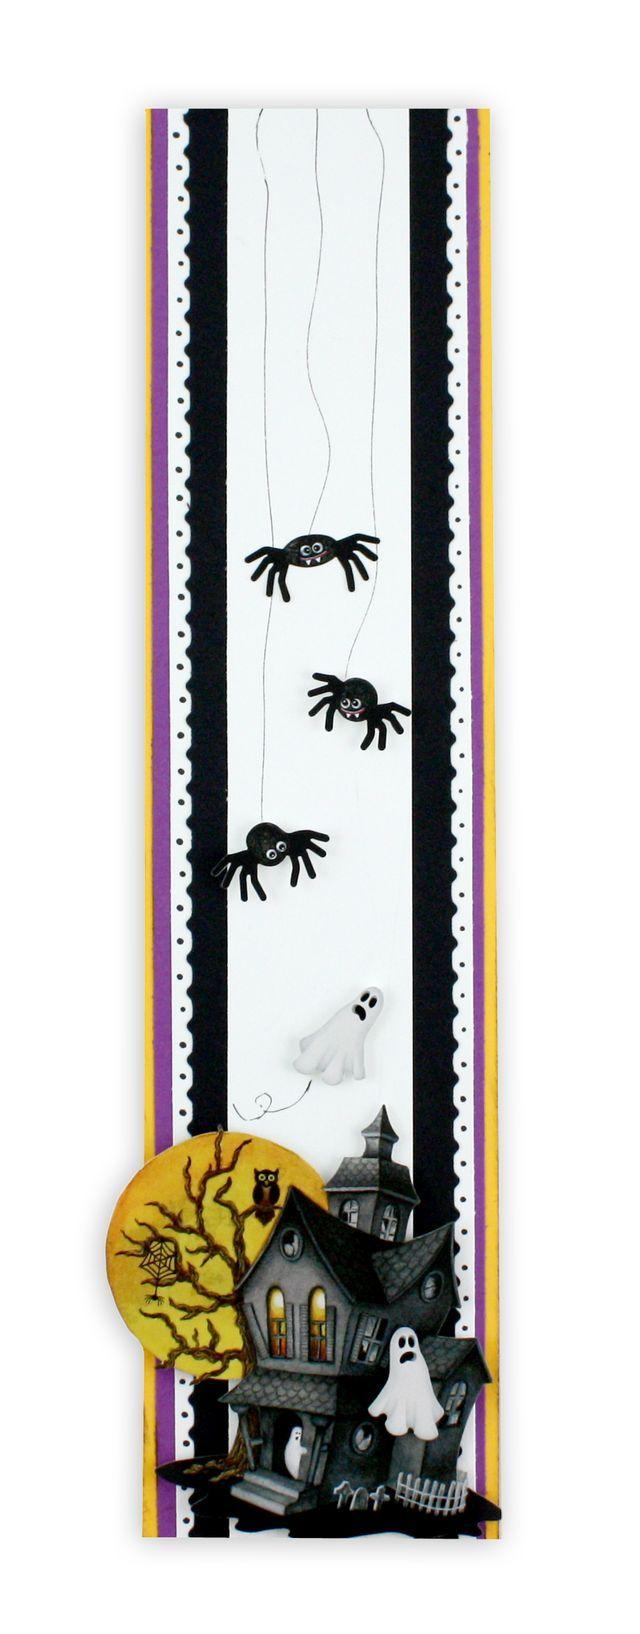 Scrapbook ideas multiple pictures - Classic Halloween Stickers Scrapbook Border Idea